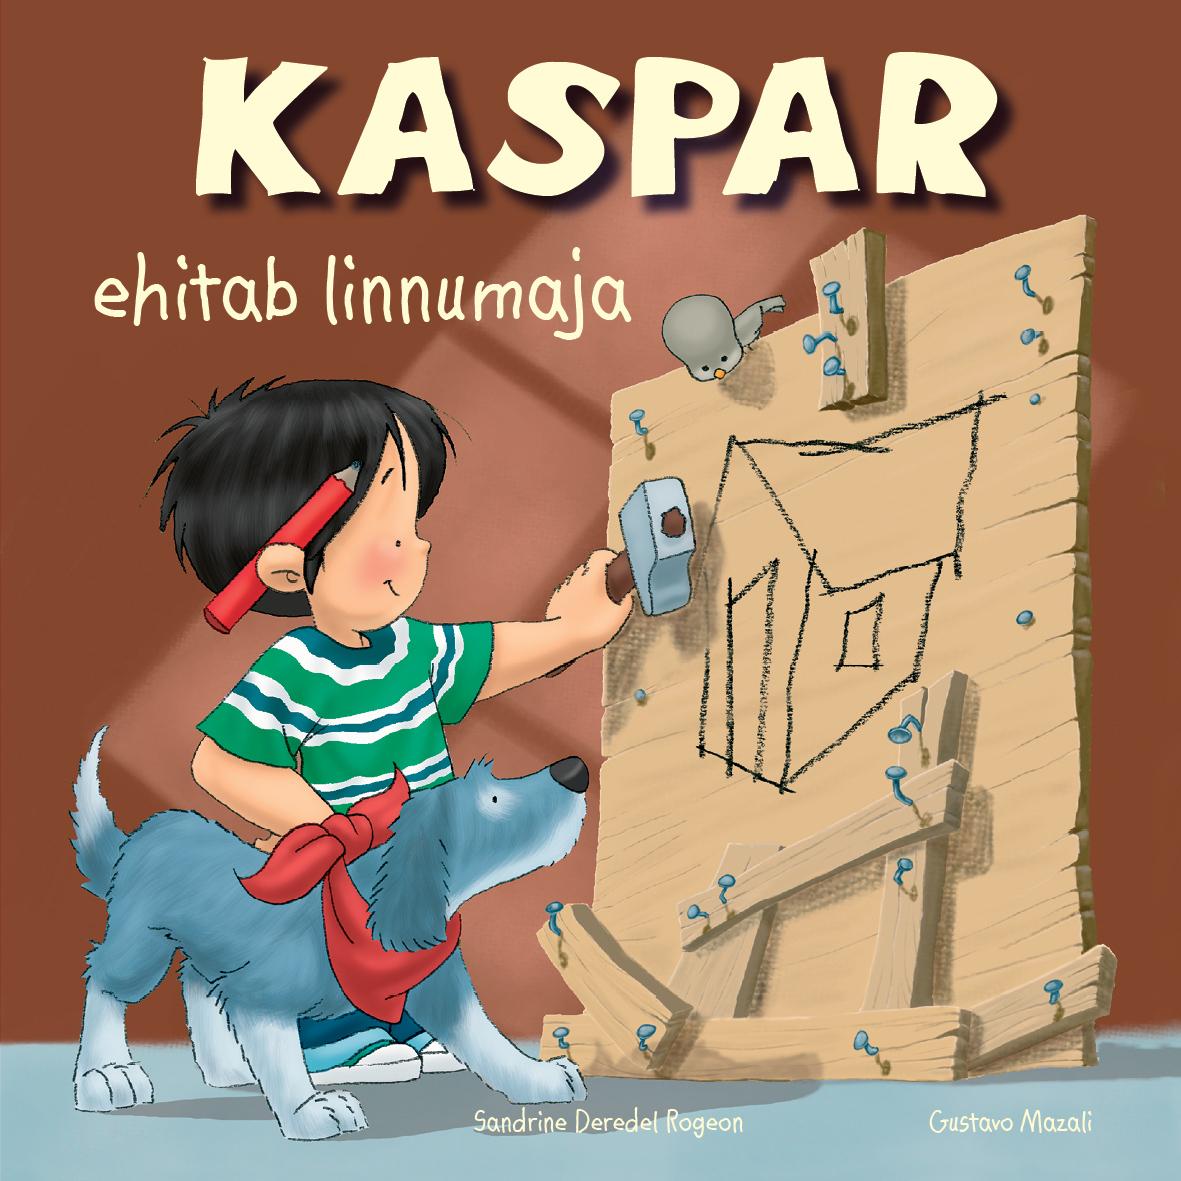 Gustavo Mazali Kaspar ehitab linnumaja школьная книга bronchoplasty epub